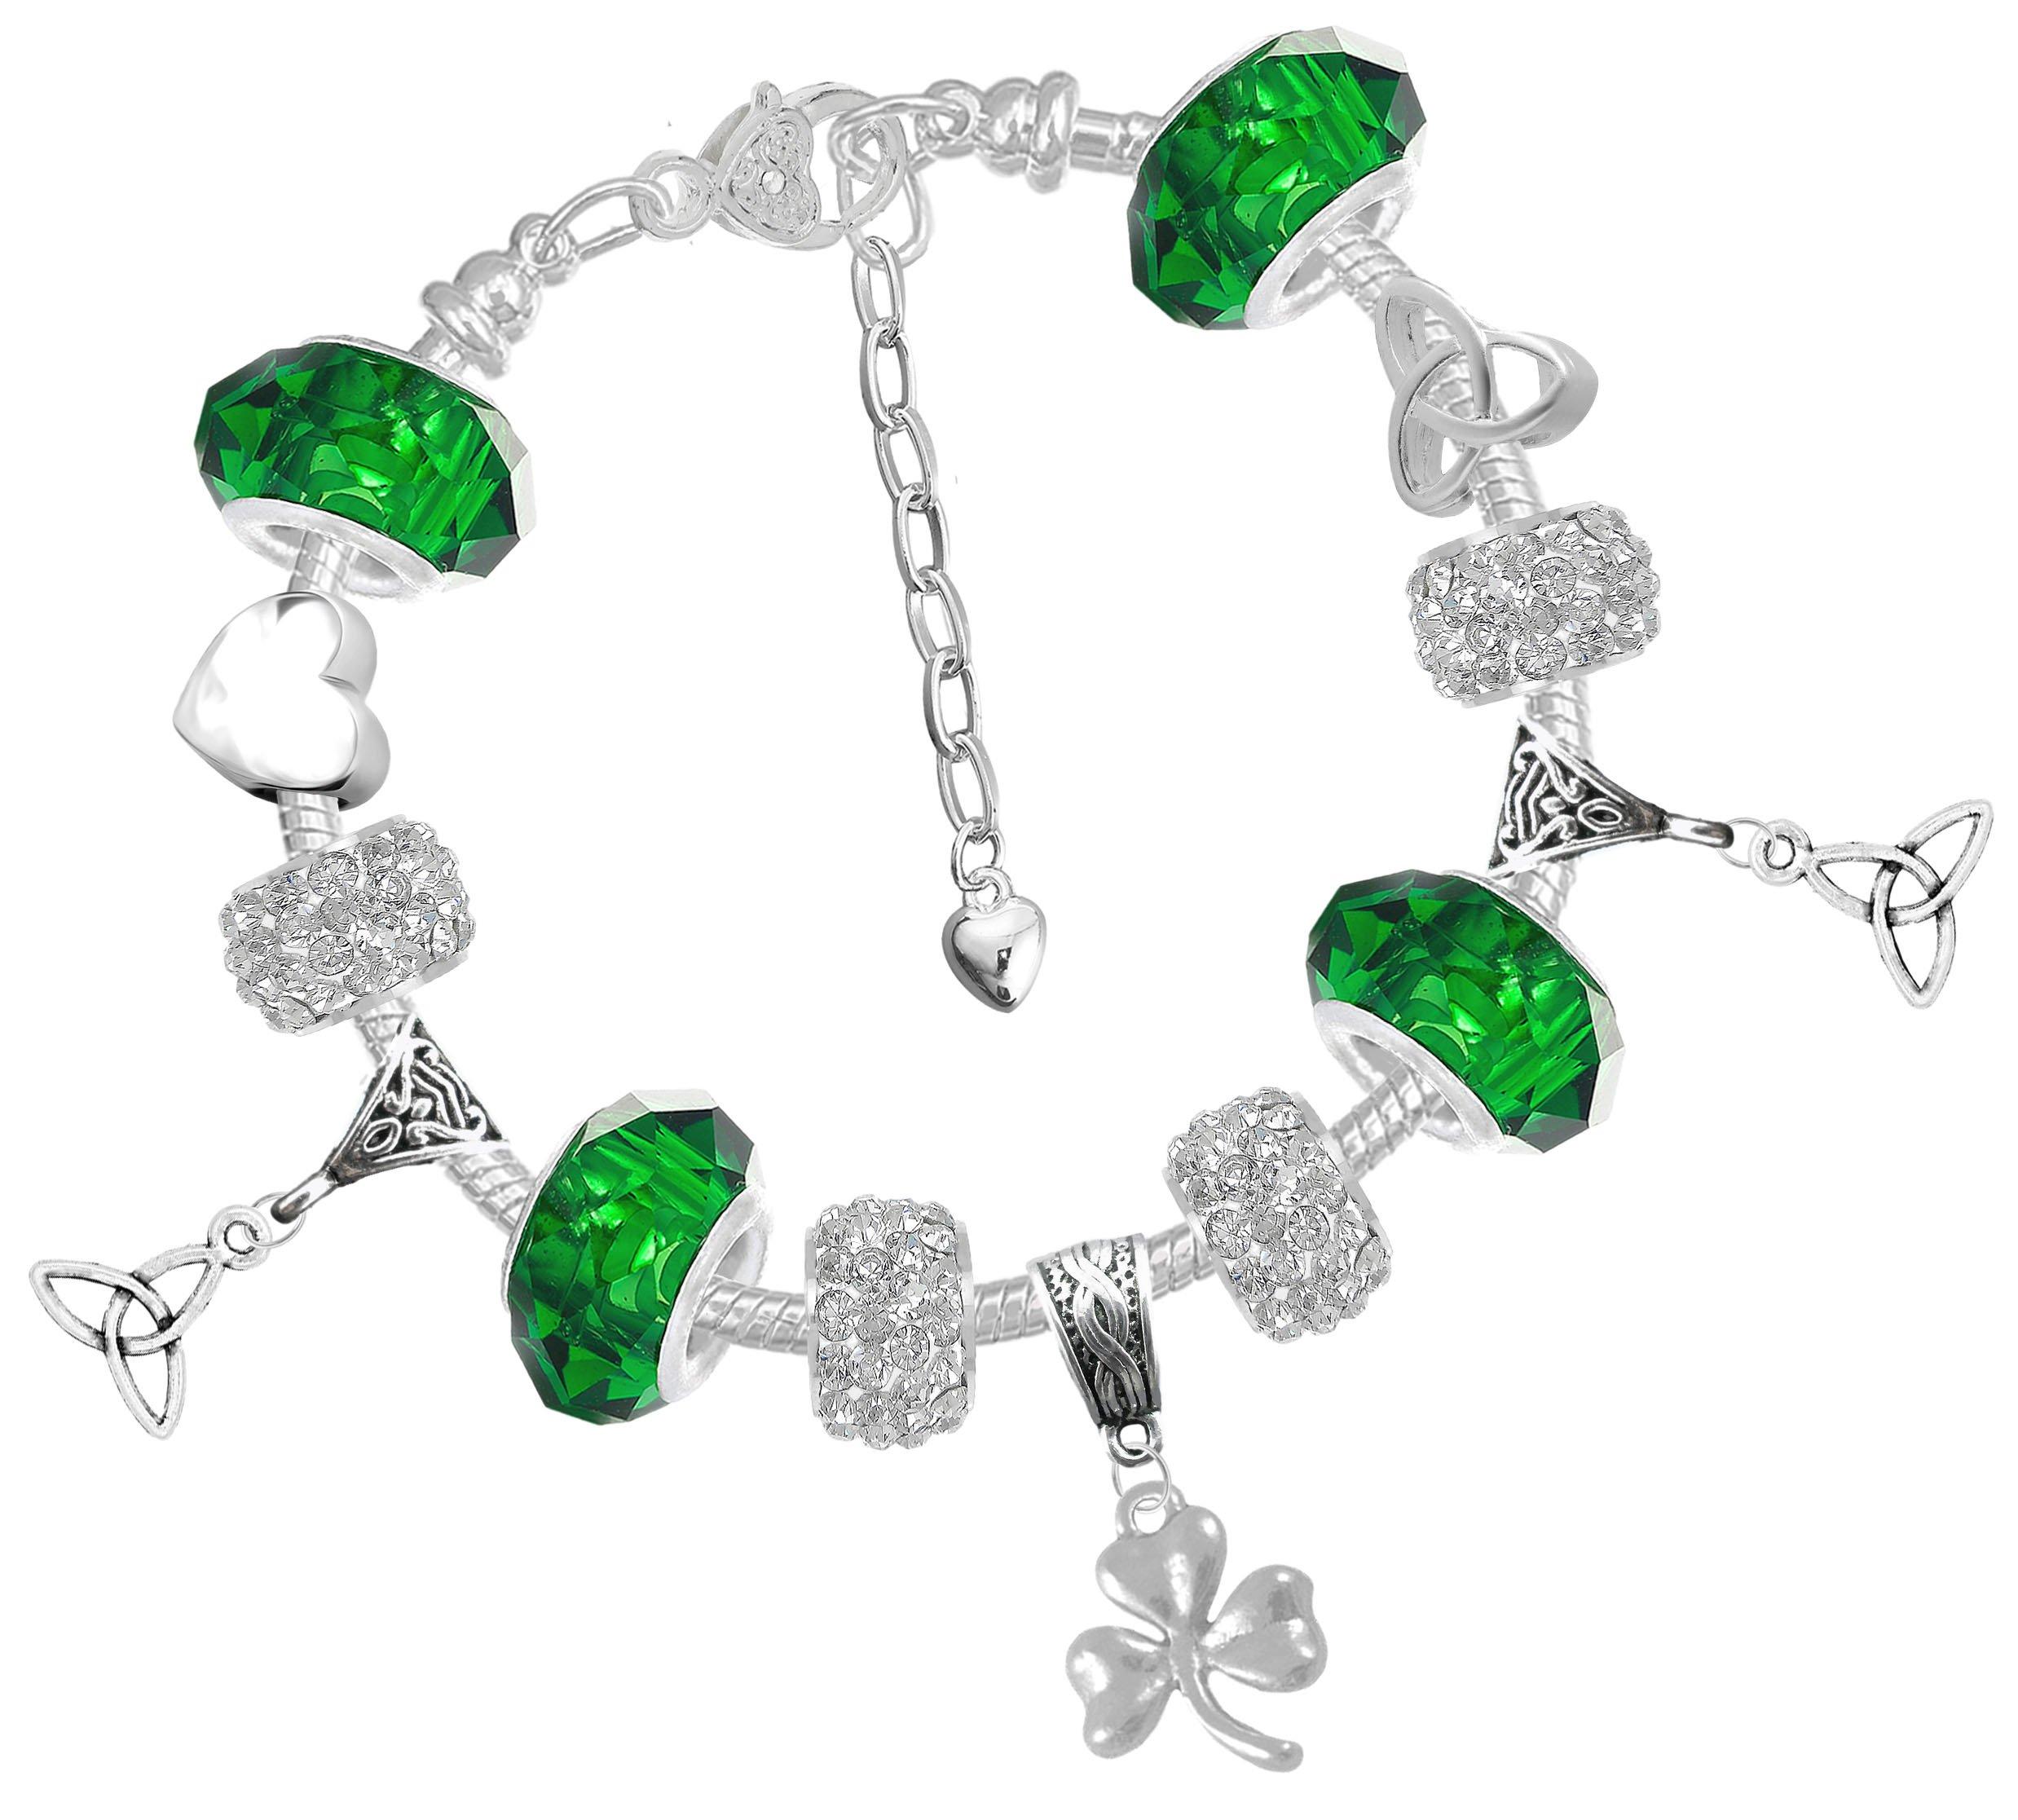 Celtic Heart Triquetra Shamrock St Patricks Day Charm Bracelet with Gift Box Ys7n52eR